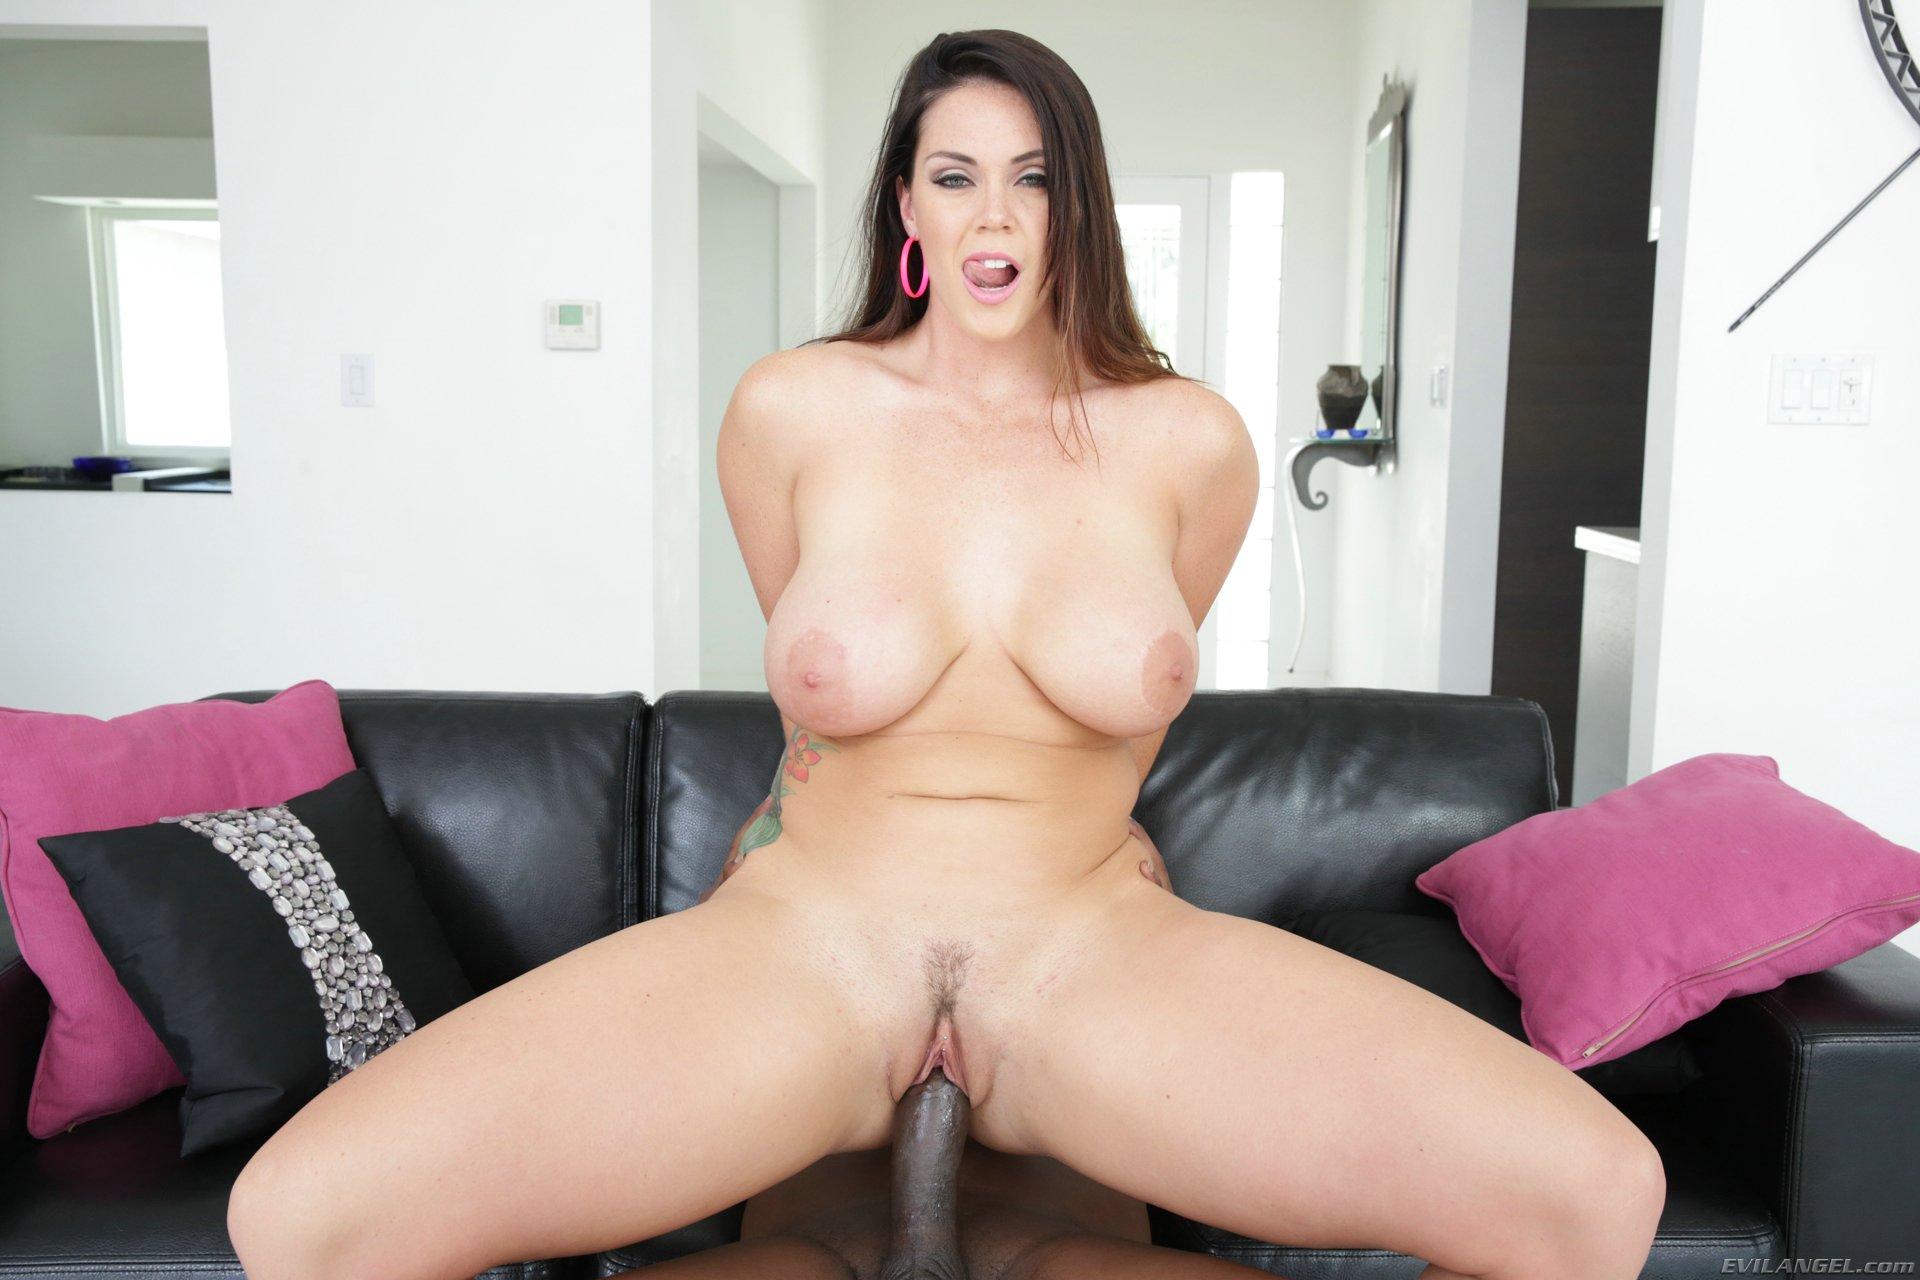 Deep anal videos